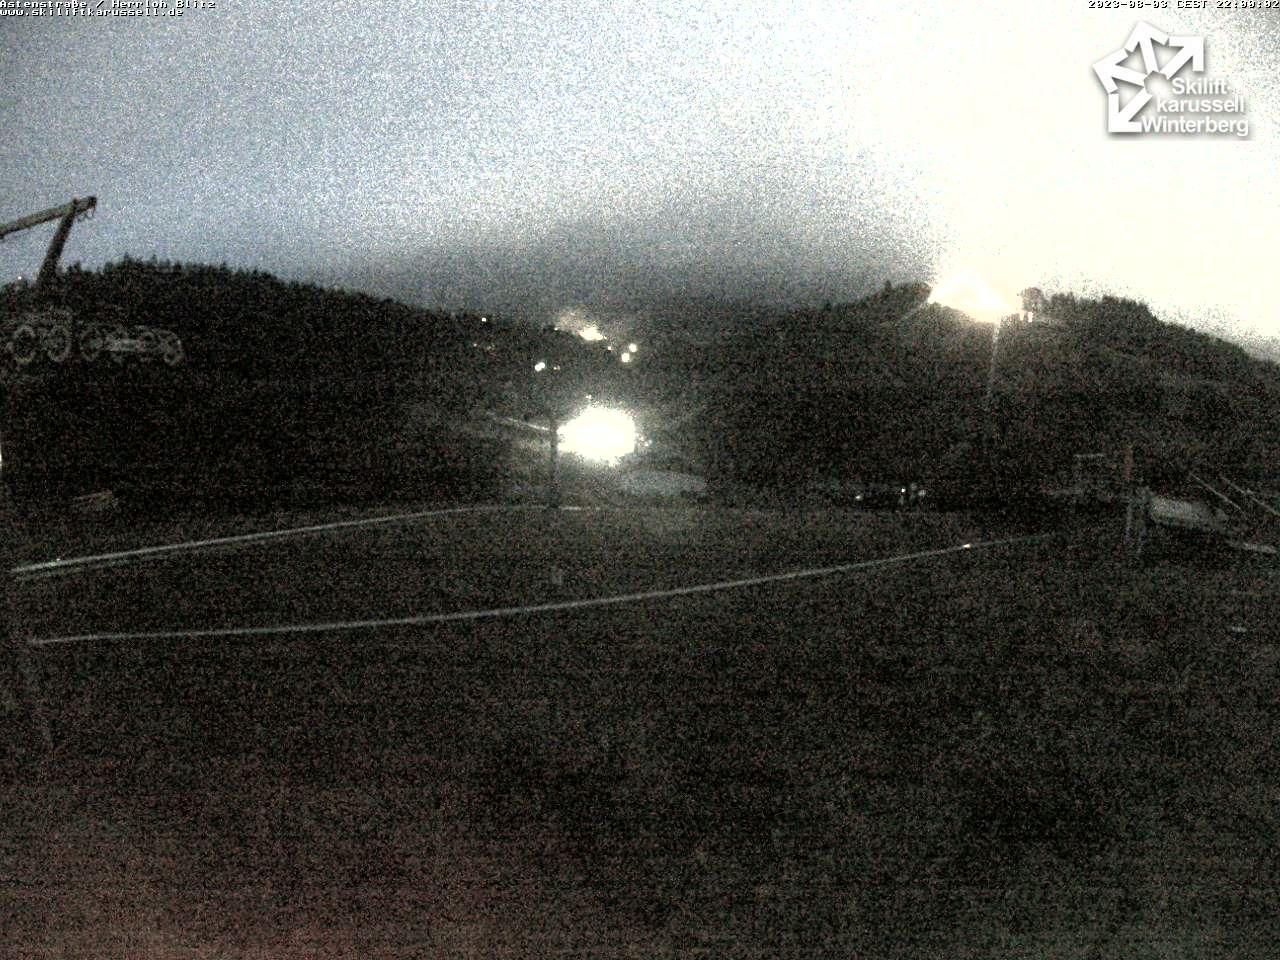 Skiliftkarussell Astenstrasse Winterberg Webcam